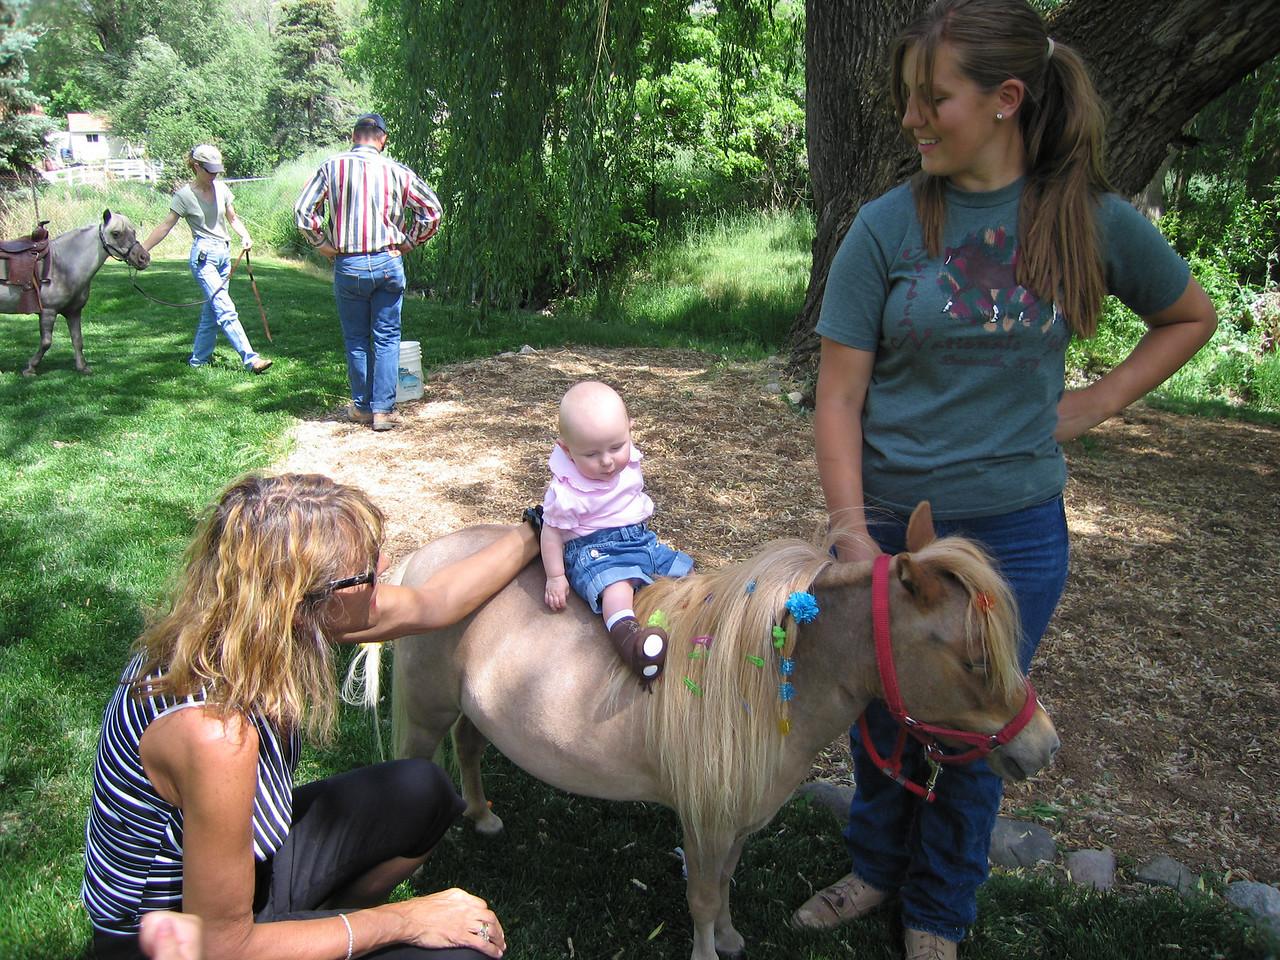 Paige on the mini horse